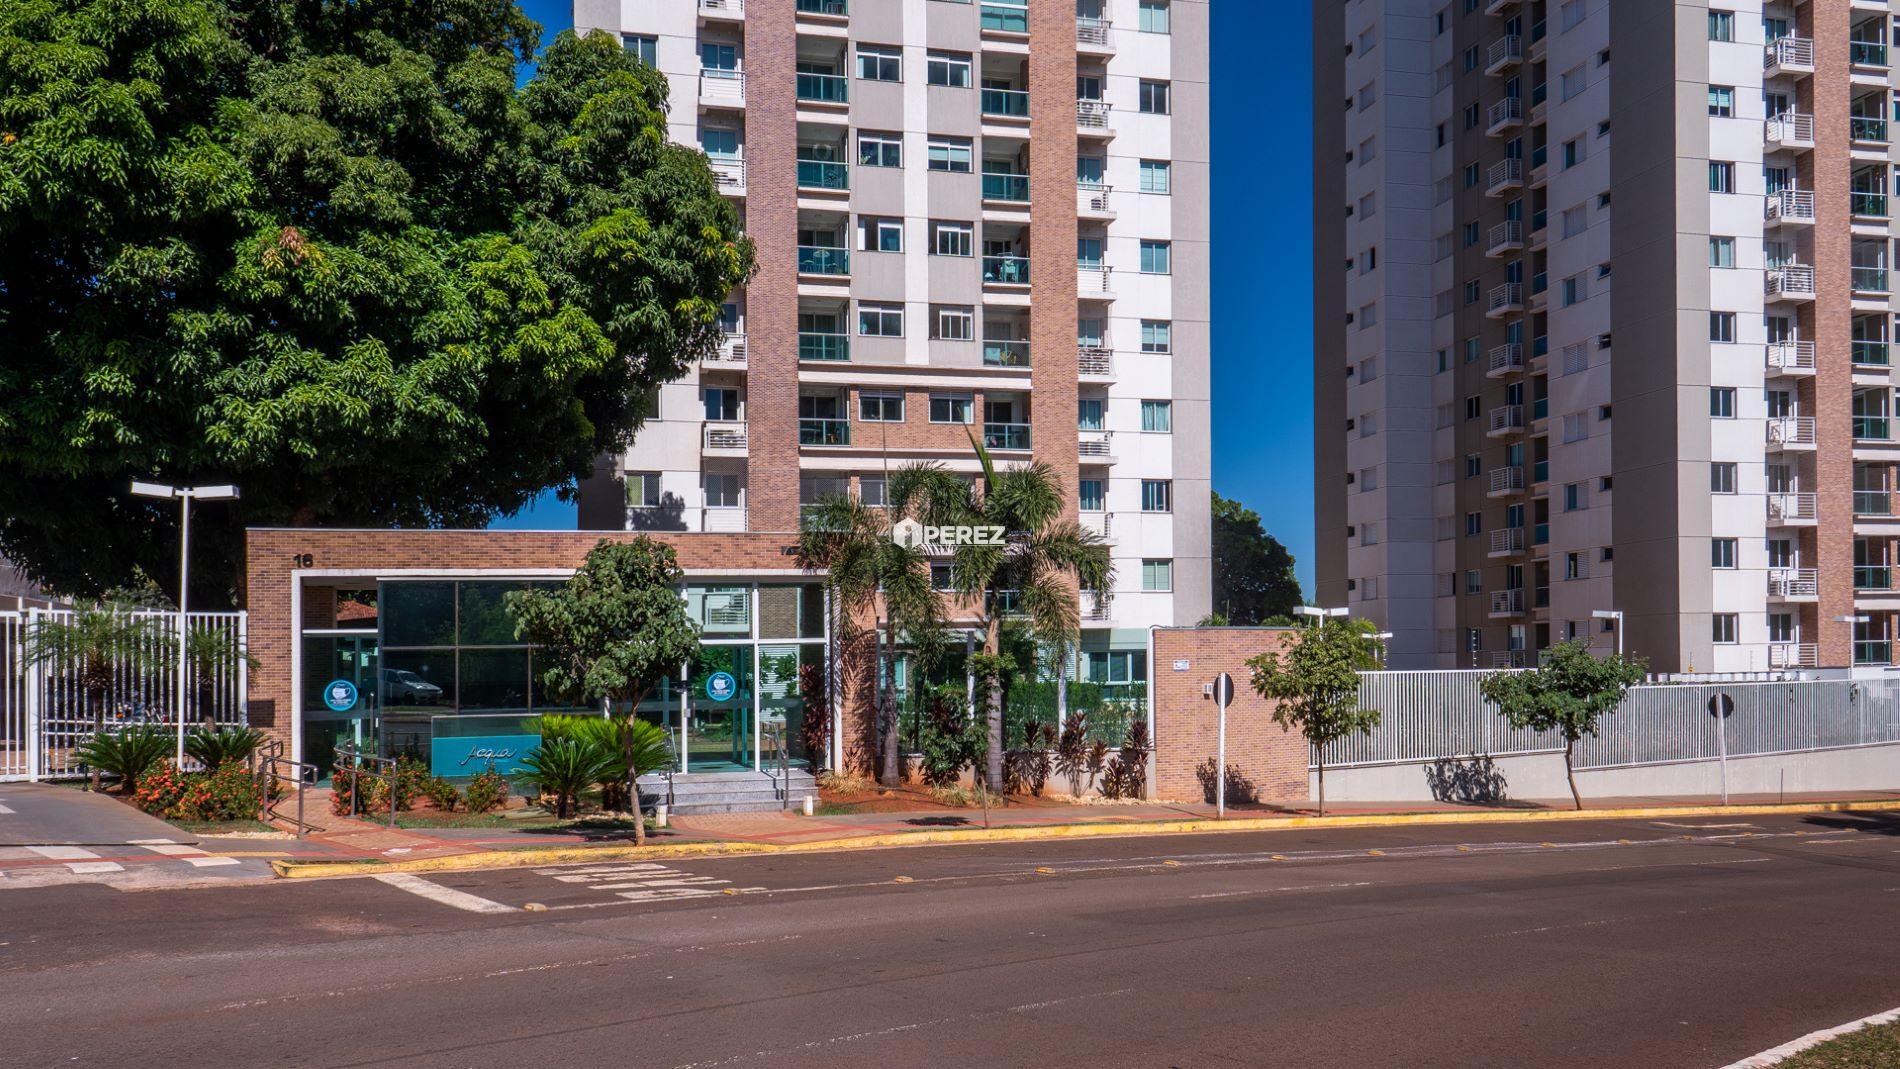 aluguel-campo-grande-ms-apartamento-rachid-neder-sao-francisco-perez-imoveis